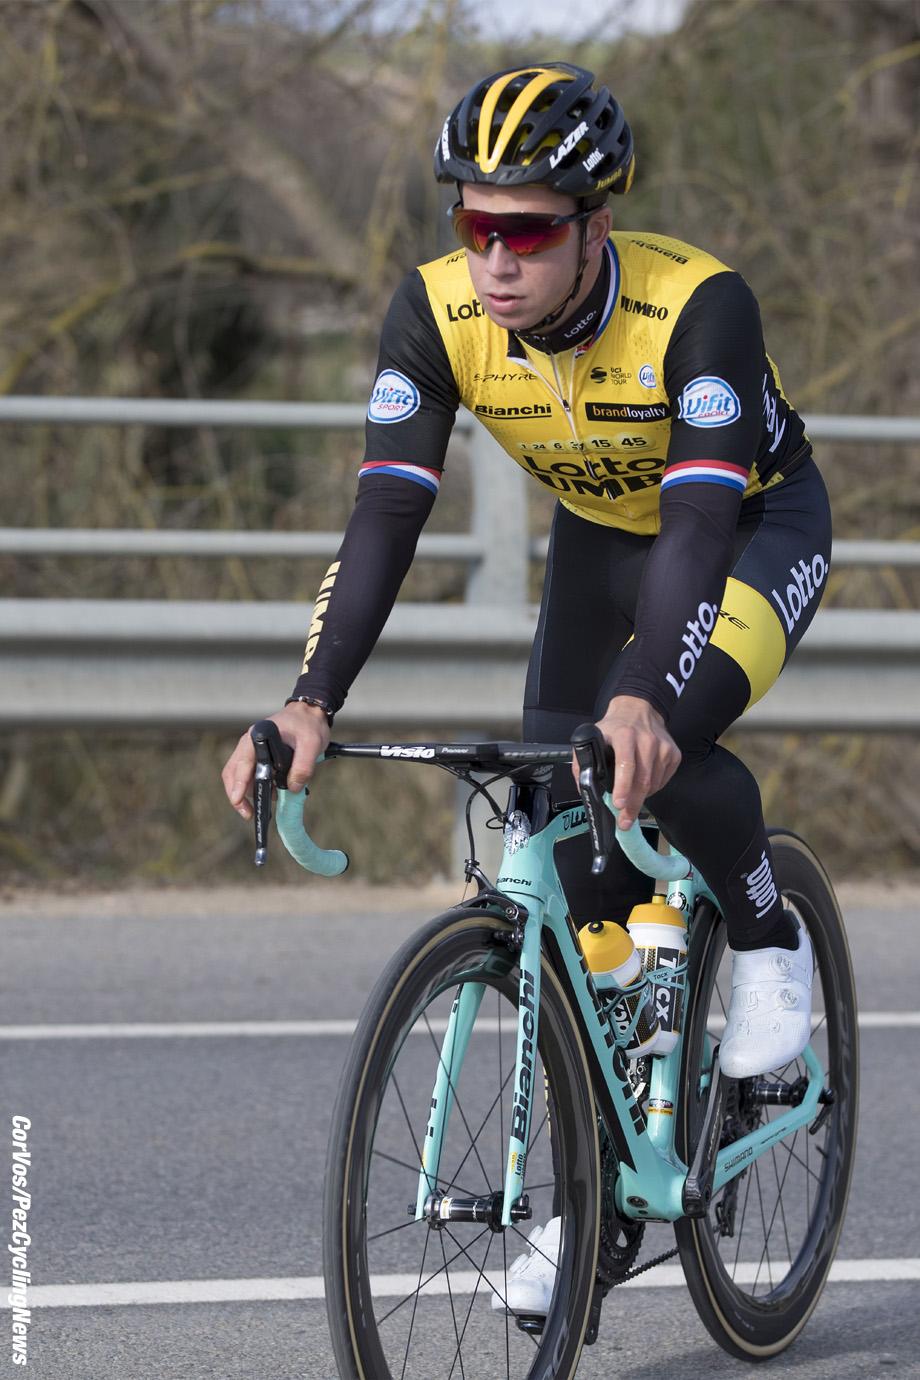 Sant Feliu de Guixois  - wielrennen - cycling - cyclisme - radsport -  Dylan GROENEWEGEN (Netherlands / Team Lotto NL - Jumbo) pictured during trainingscamp Team LottoNL-Jumbo in Spain on december 21-2017 - foto: Carla Vos/Cor Vos © 2017